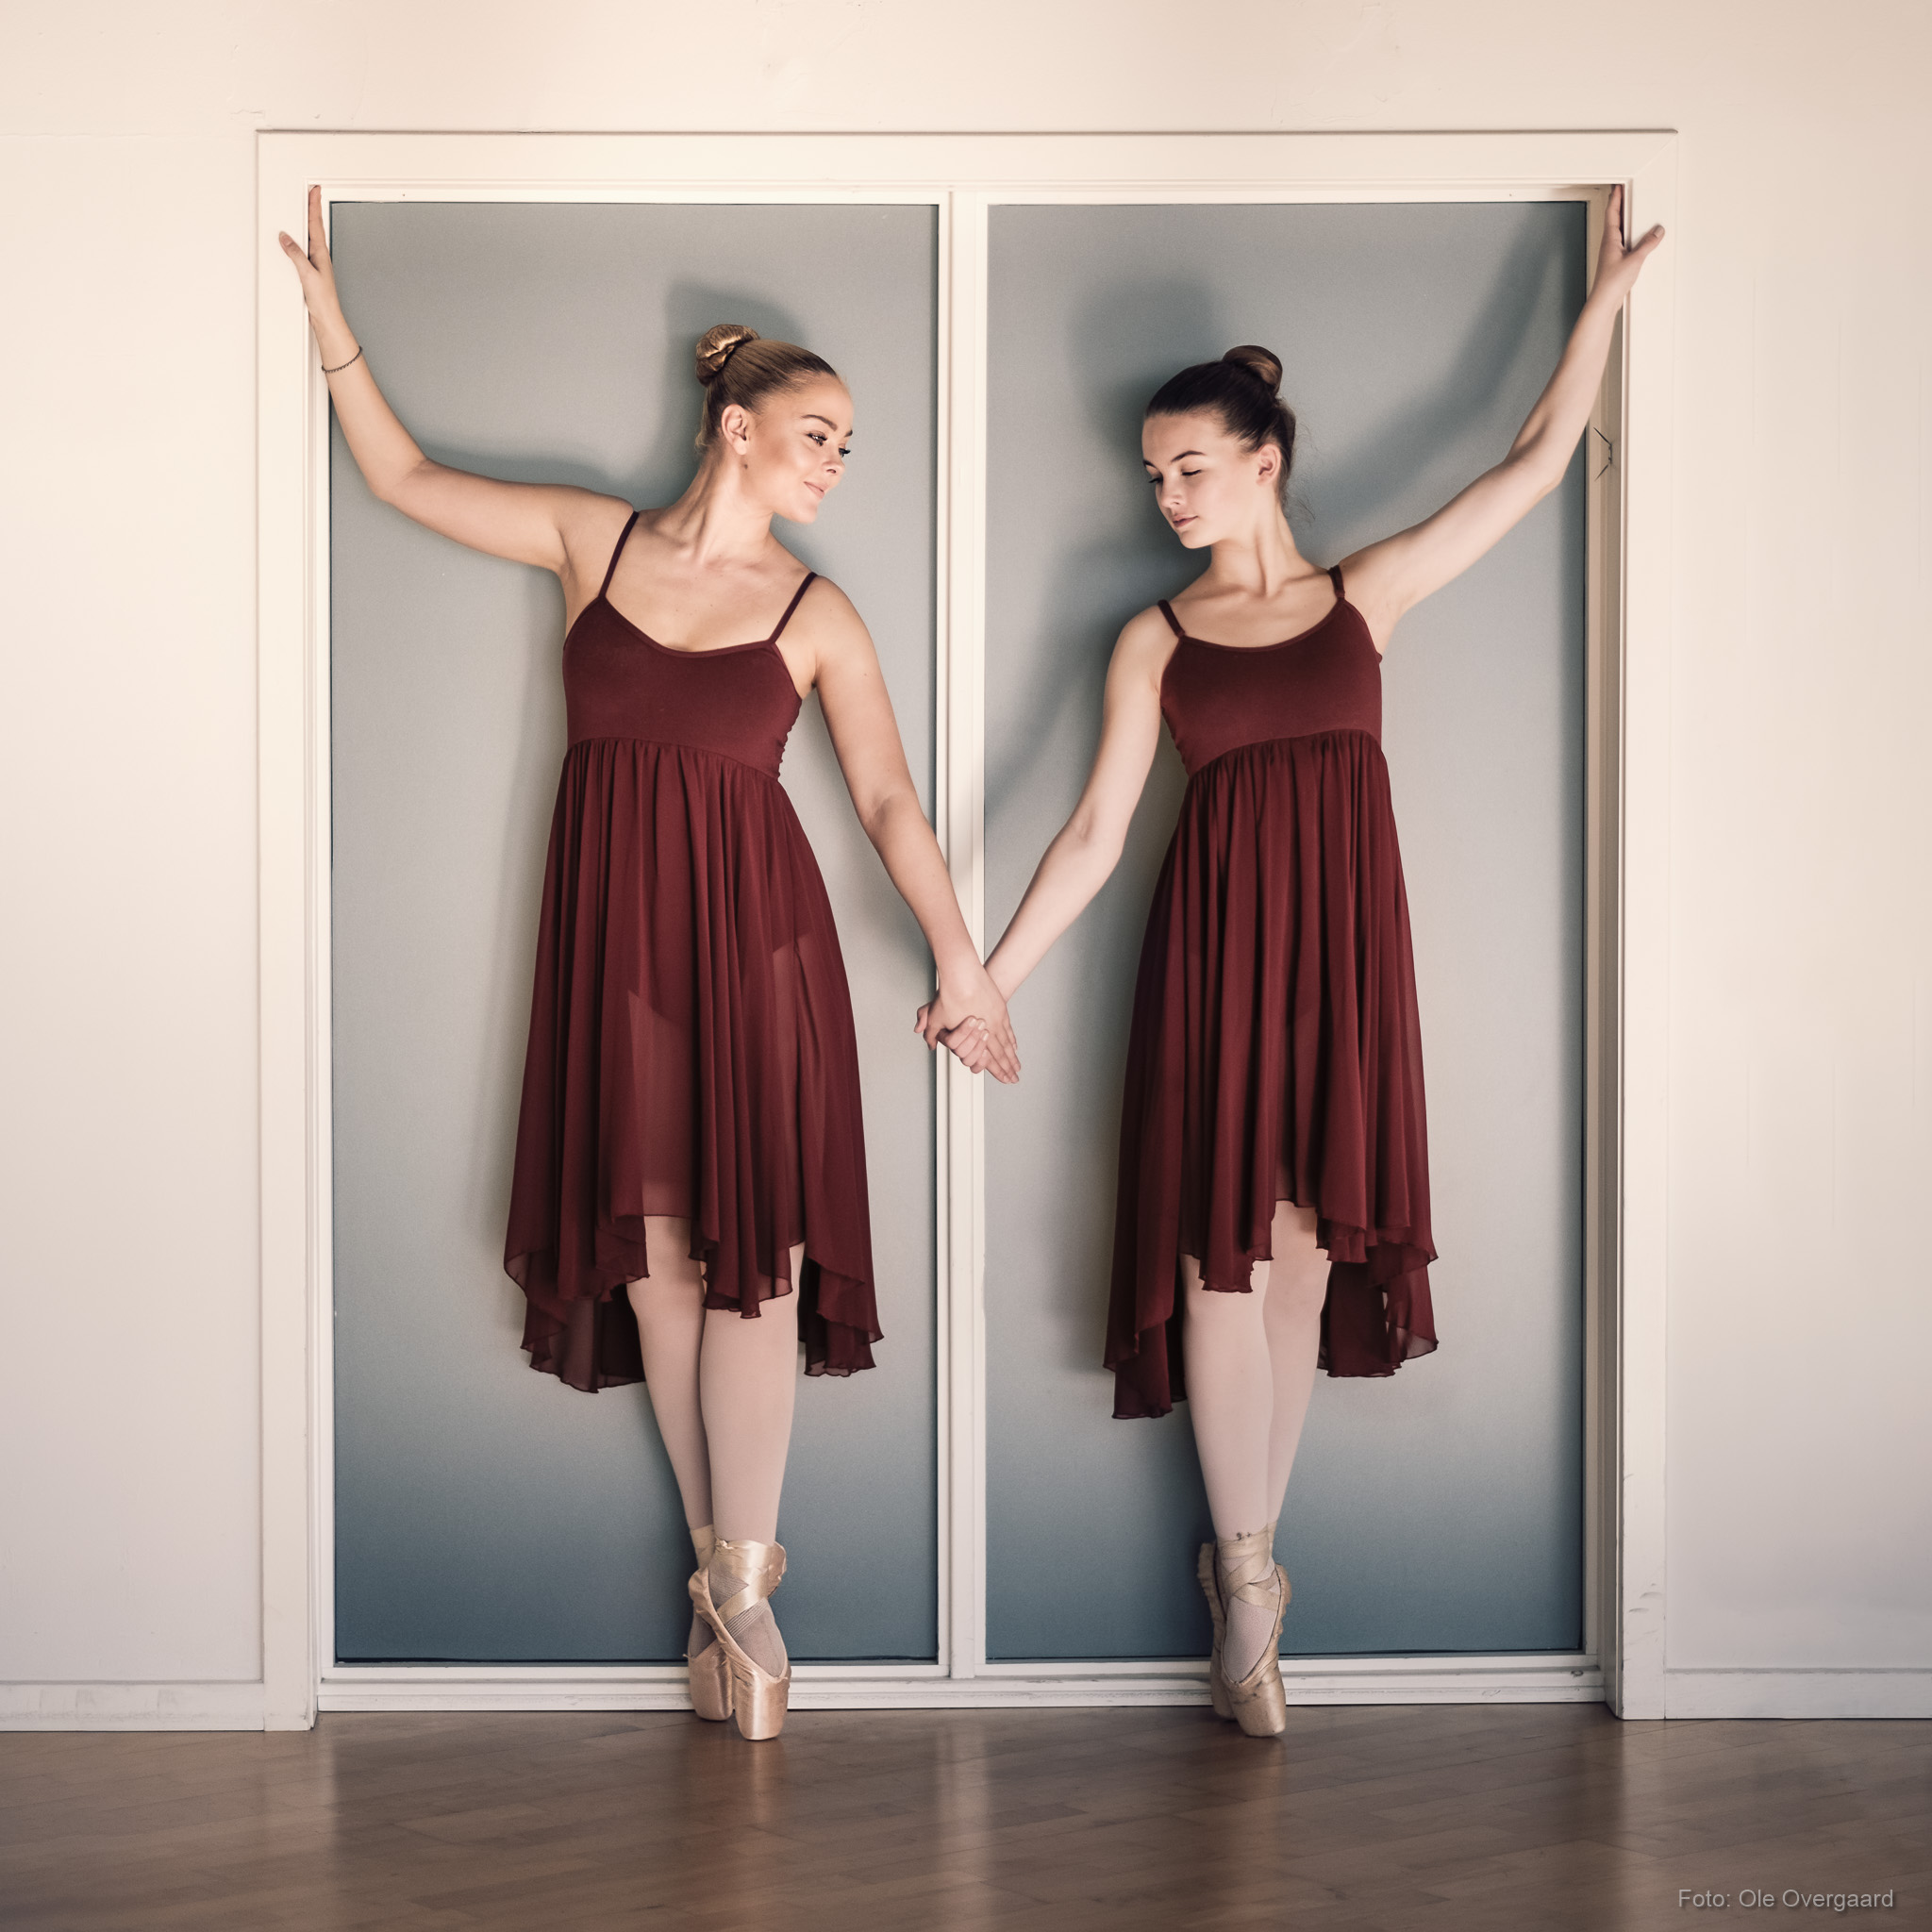 Amalie Therese Peronard & Alvilda Bech Schwartz